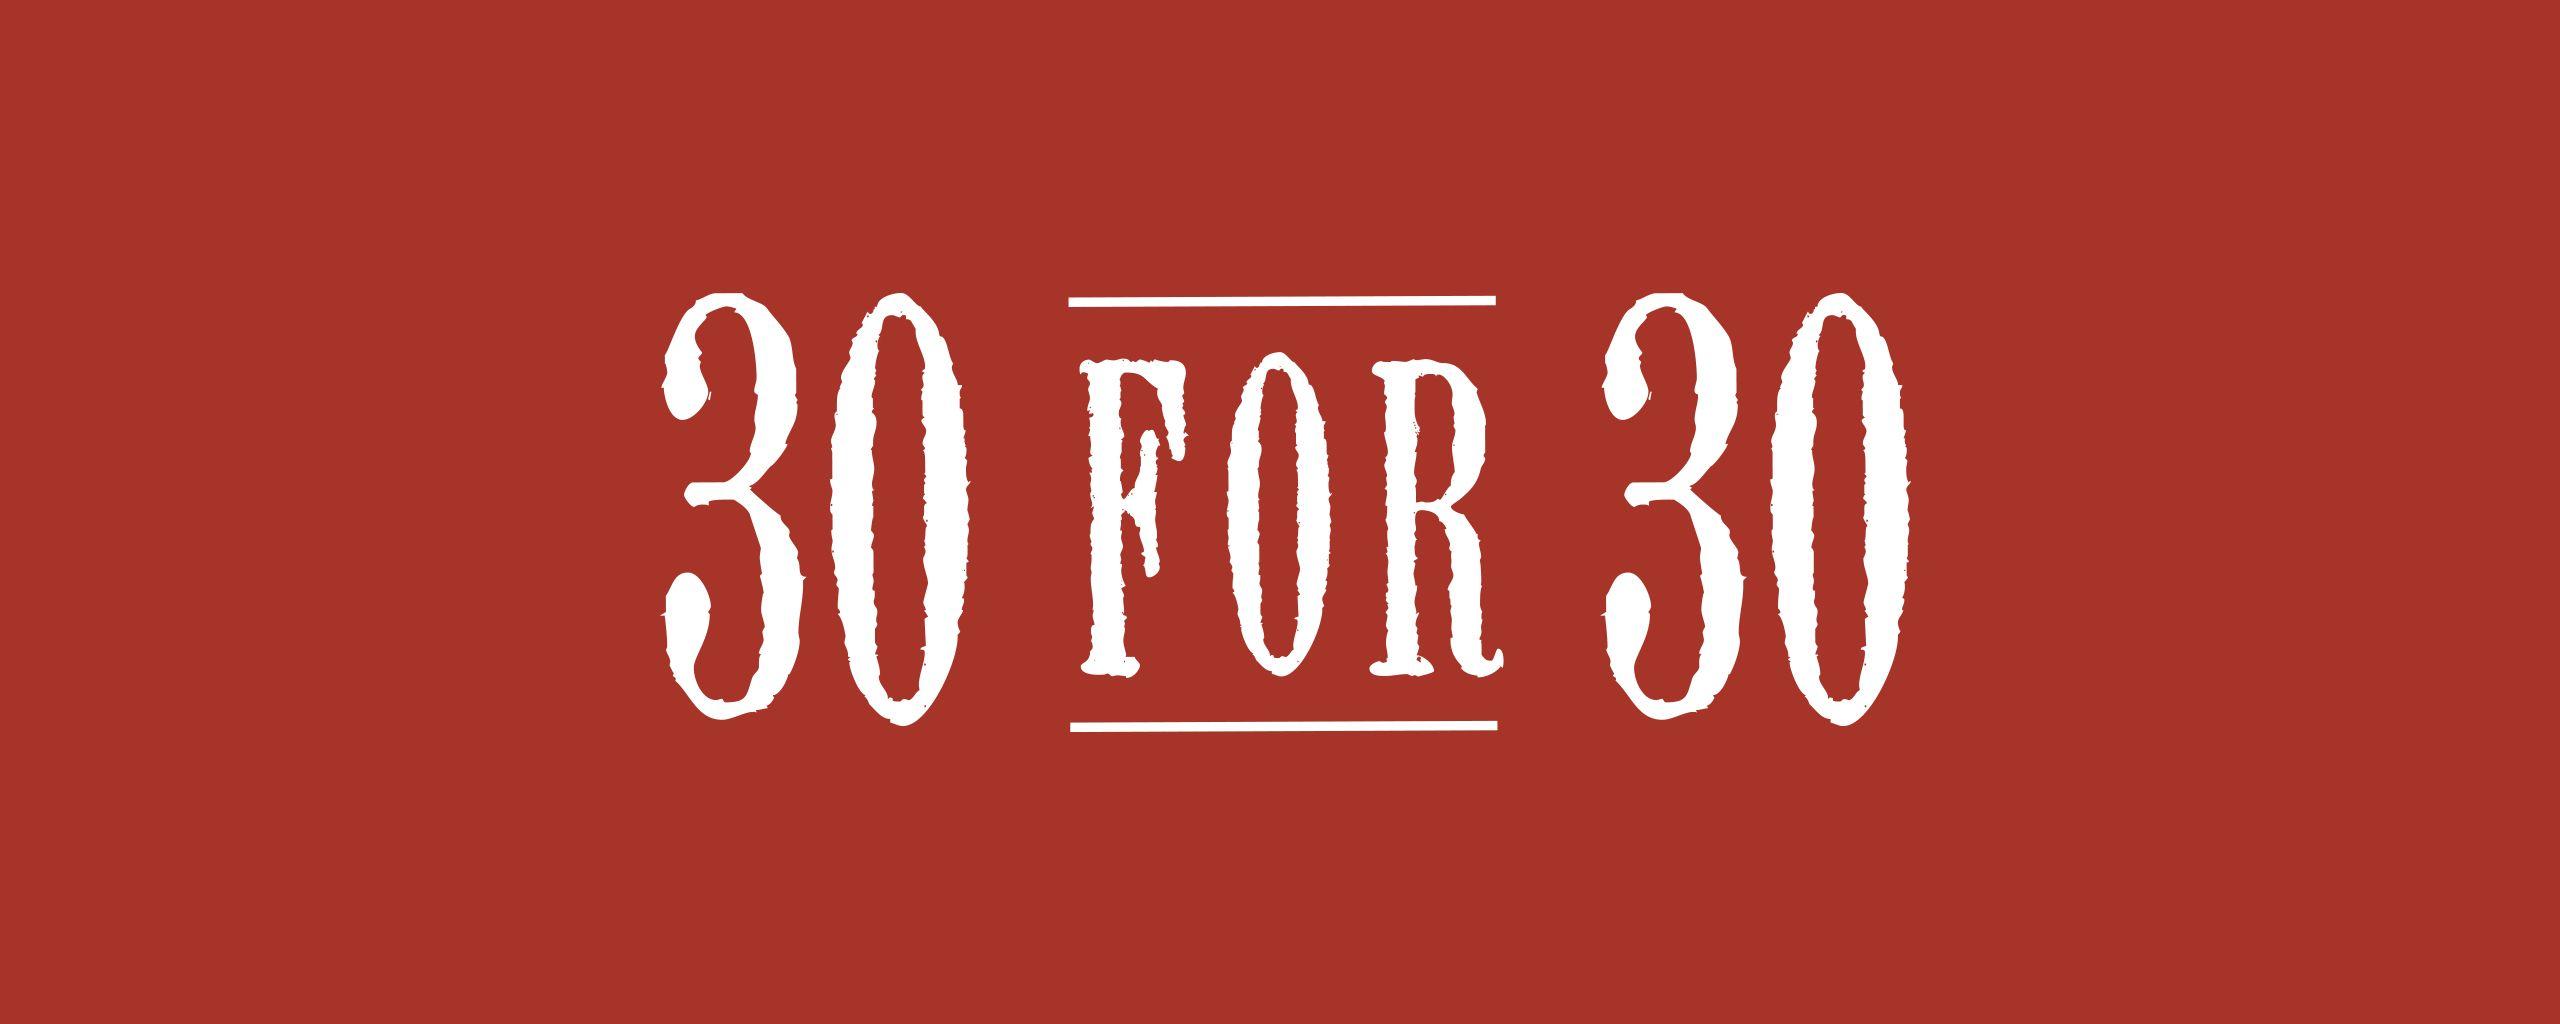 celtics lakers espn 30 for 30